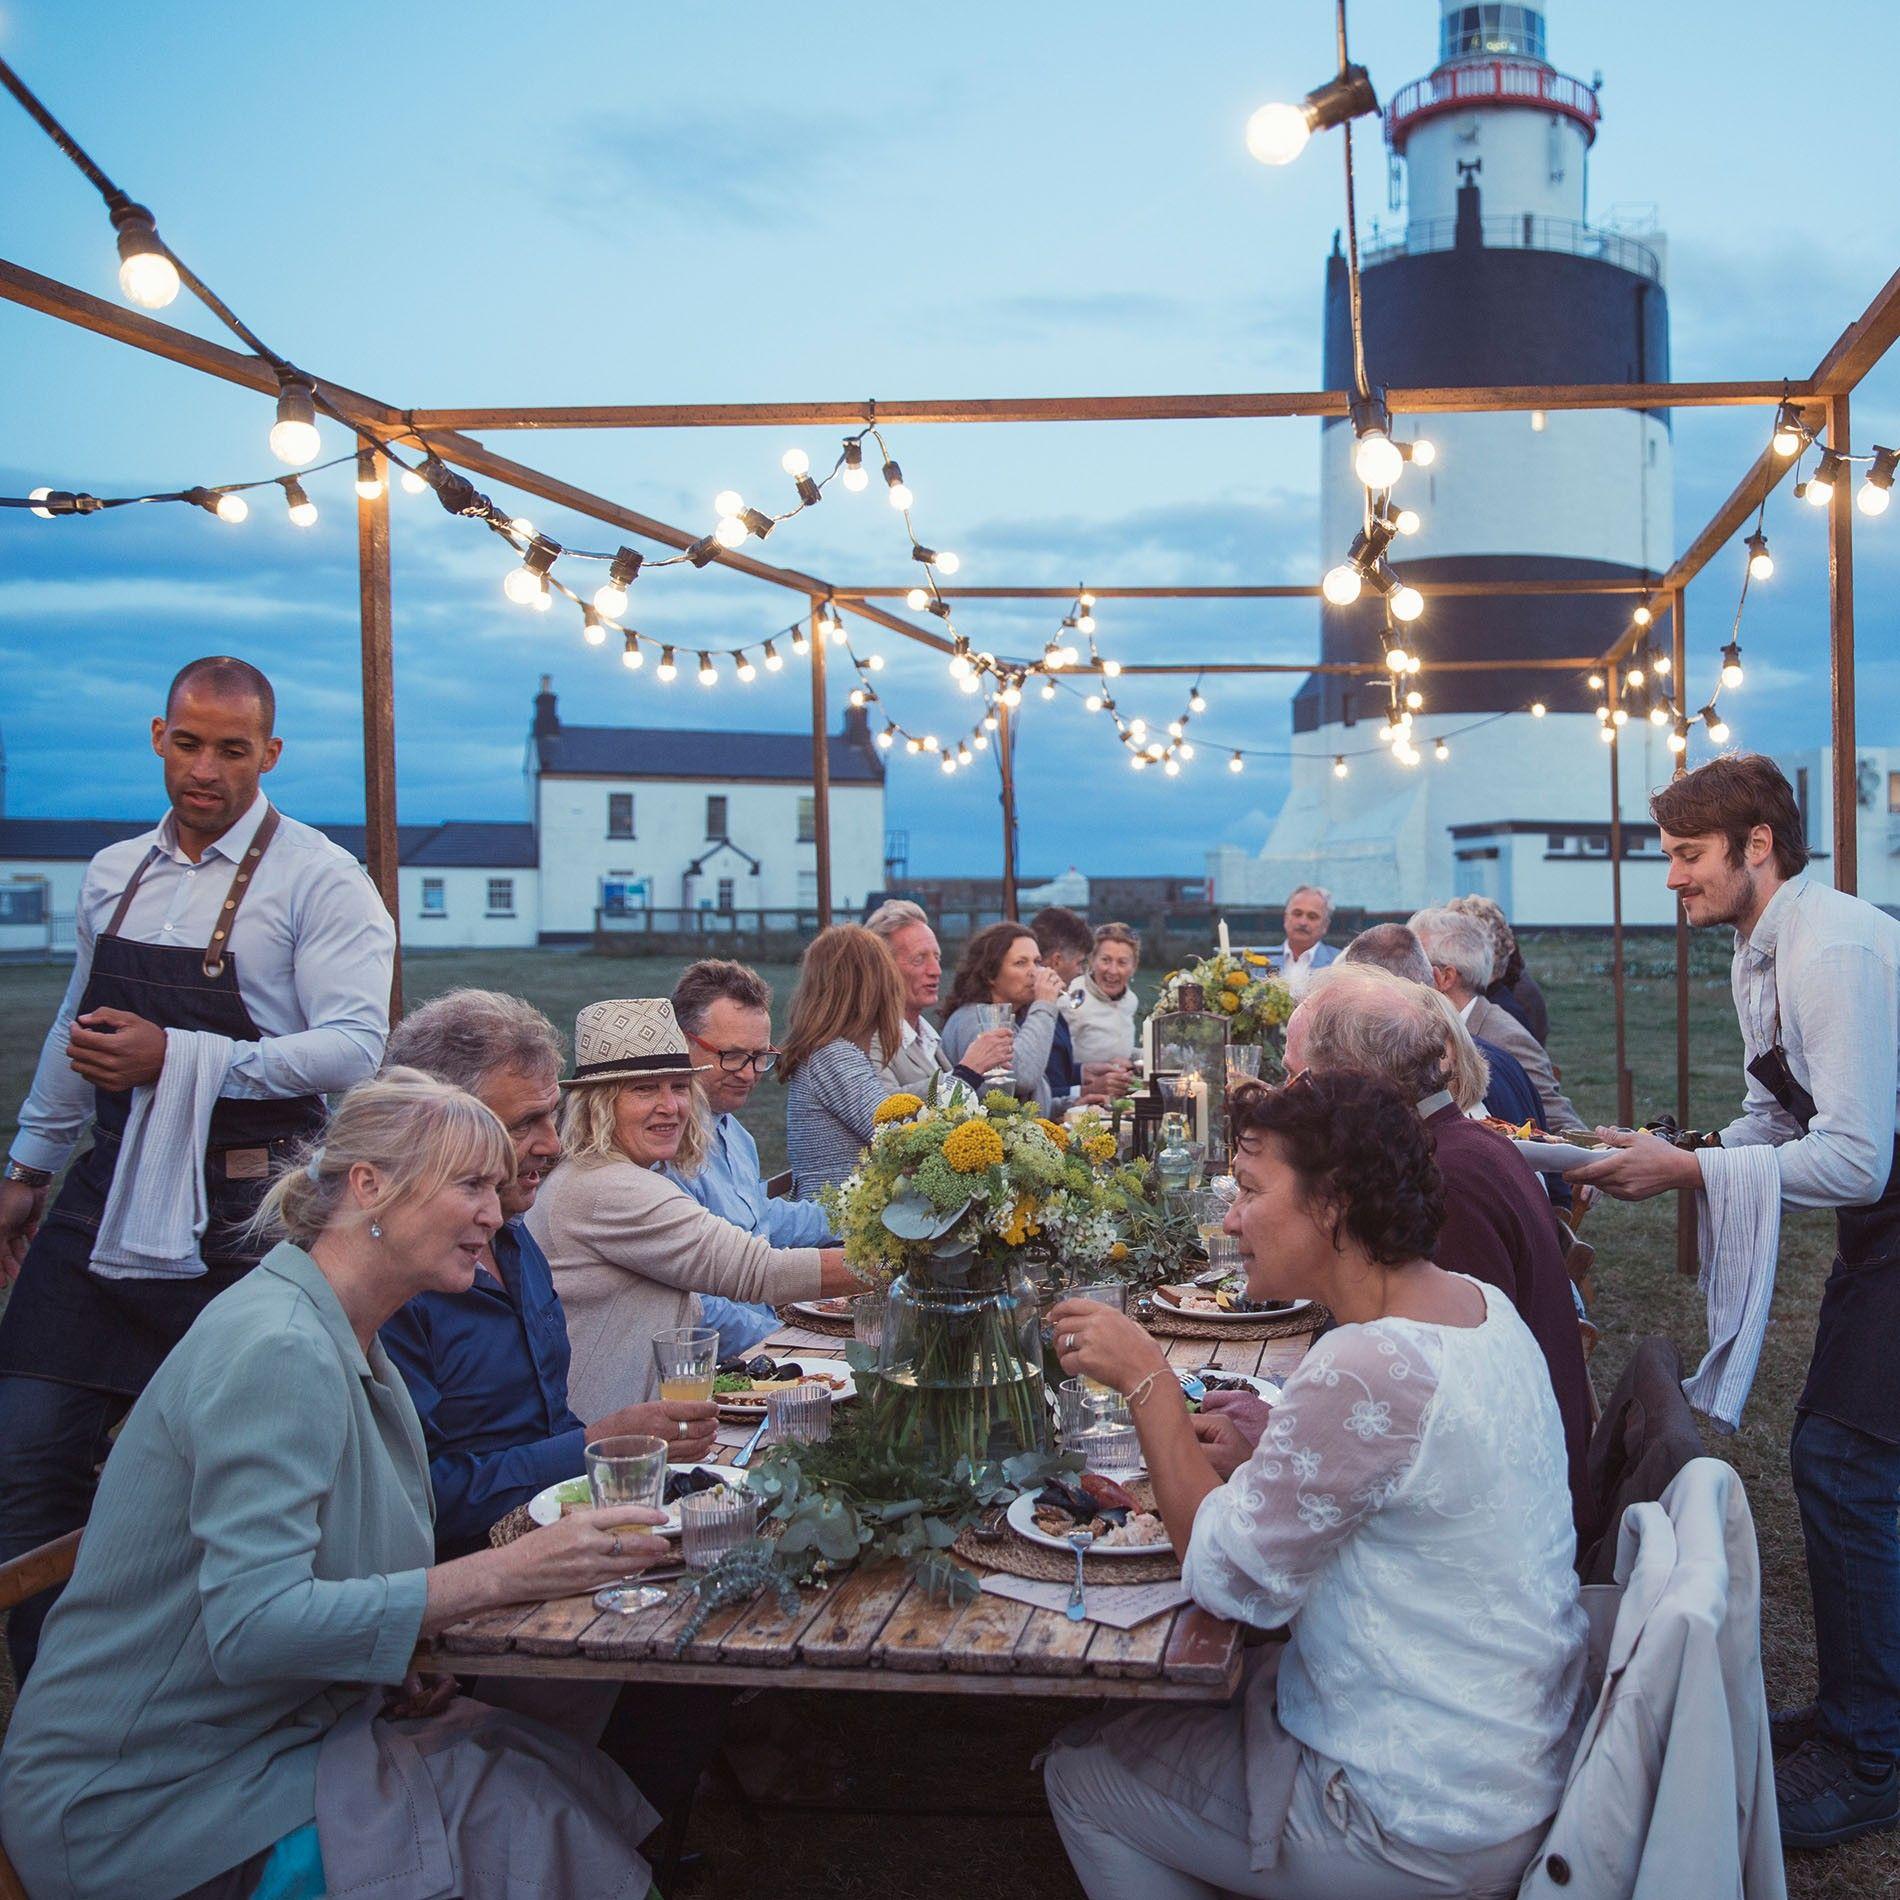 A taste of Wexford: Ireland's emerging culinary destination